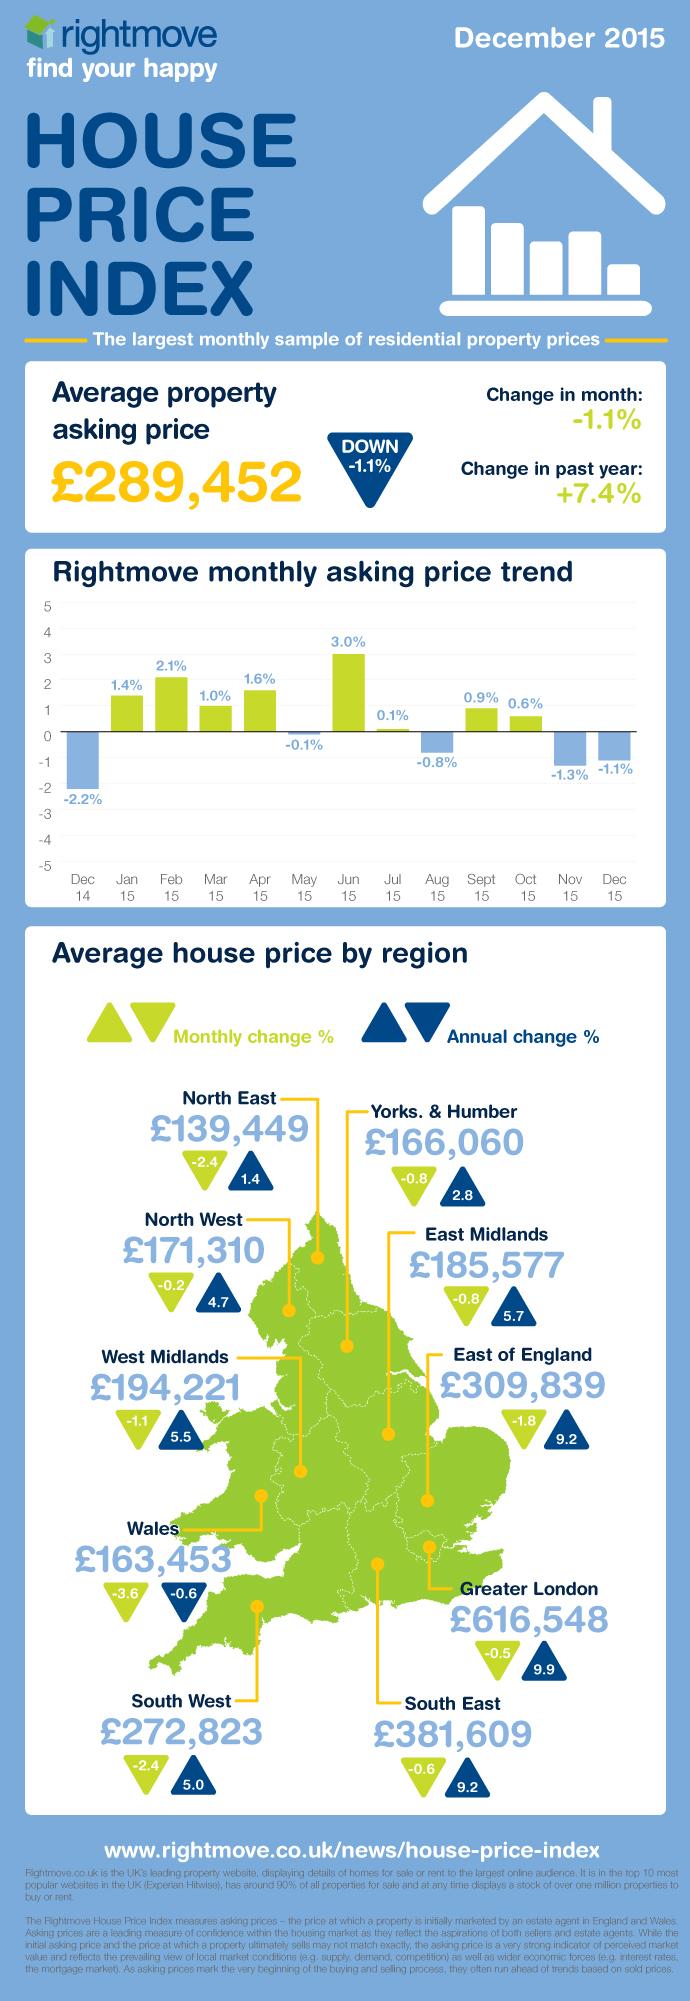 HPI_Dec15_infographic